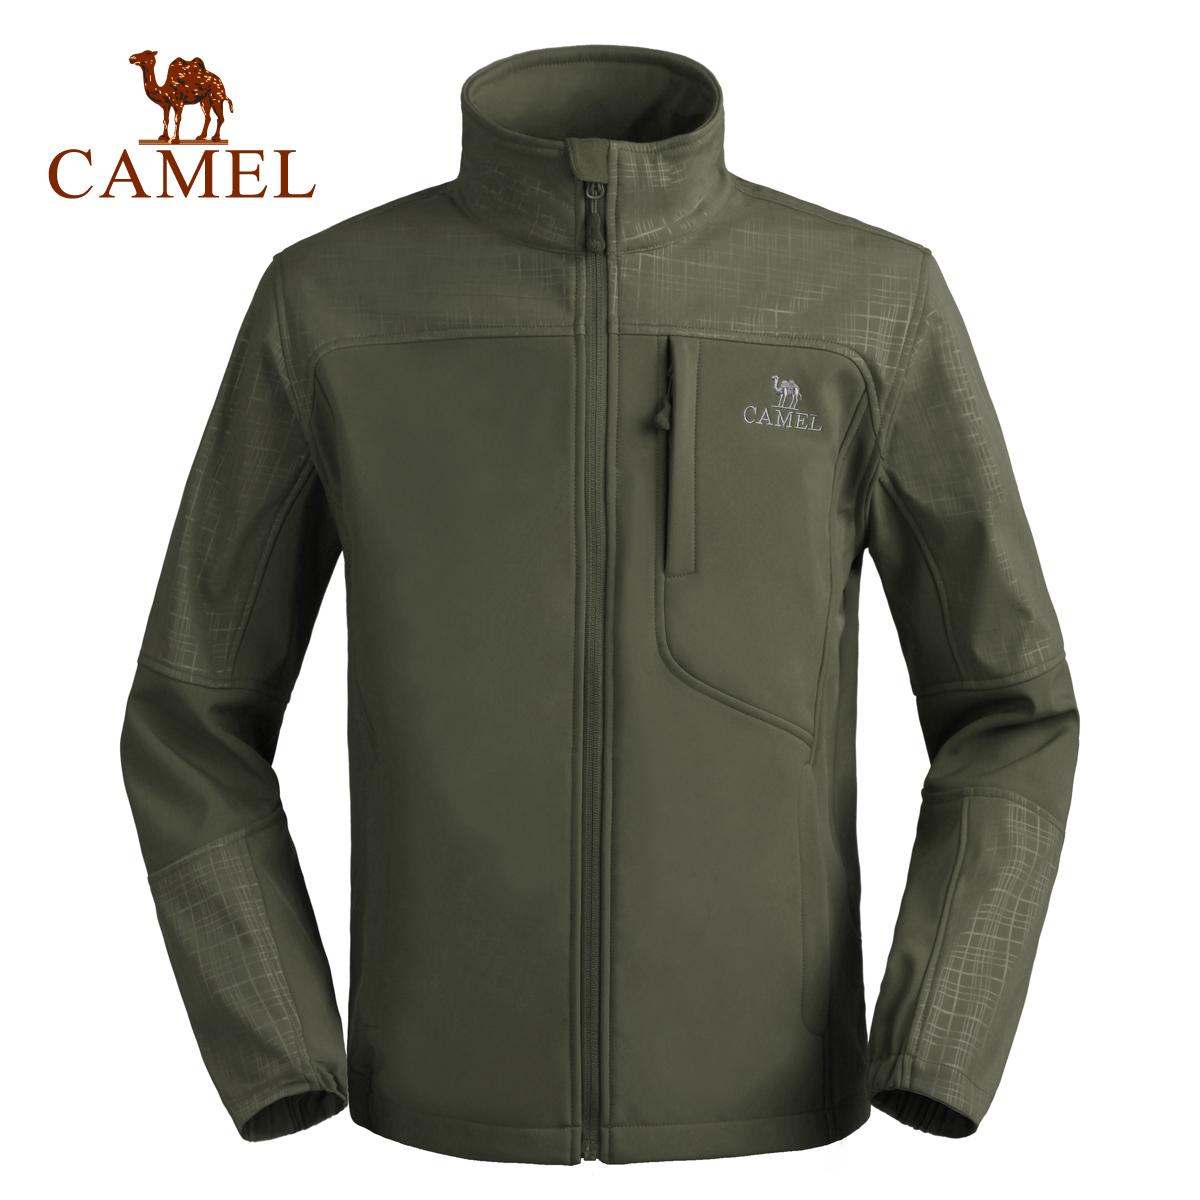 Camel/骆驼户外 春夏新品 男款休闲软壳衣 2F01235